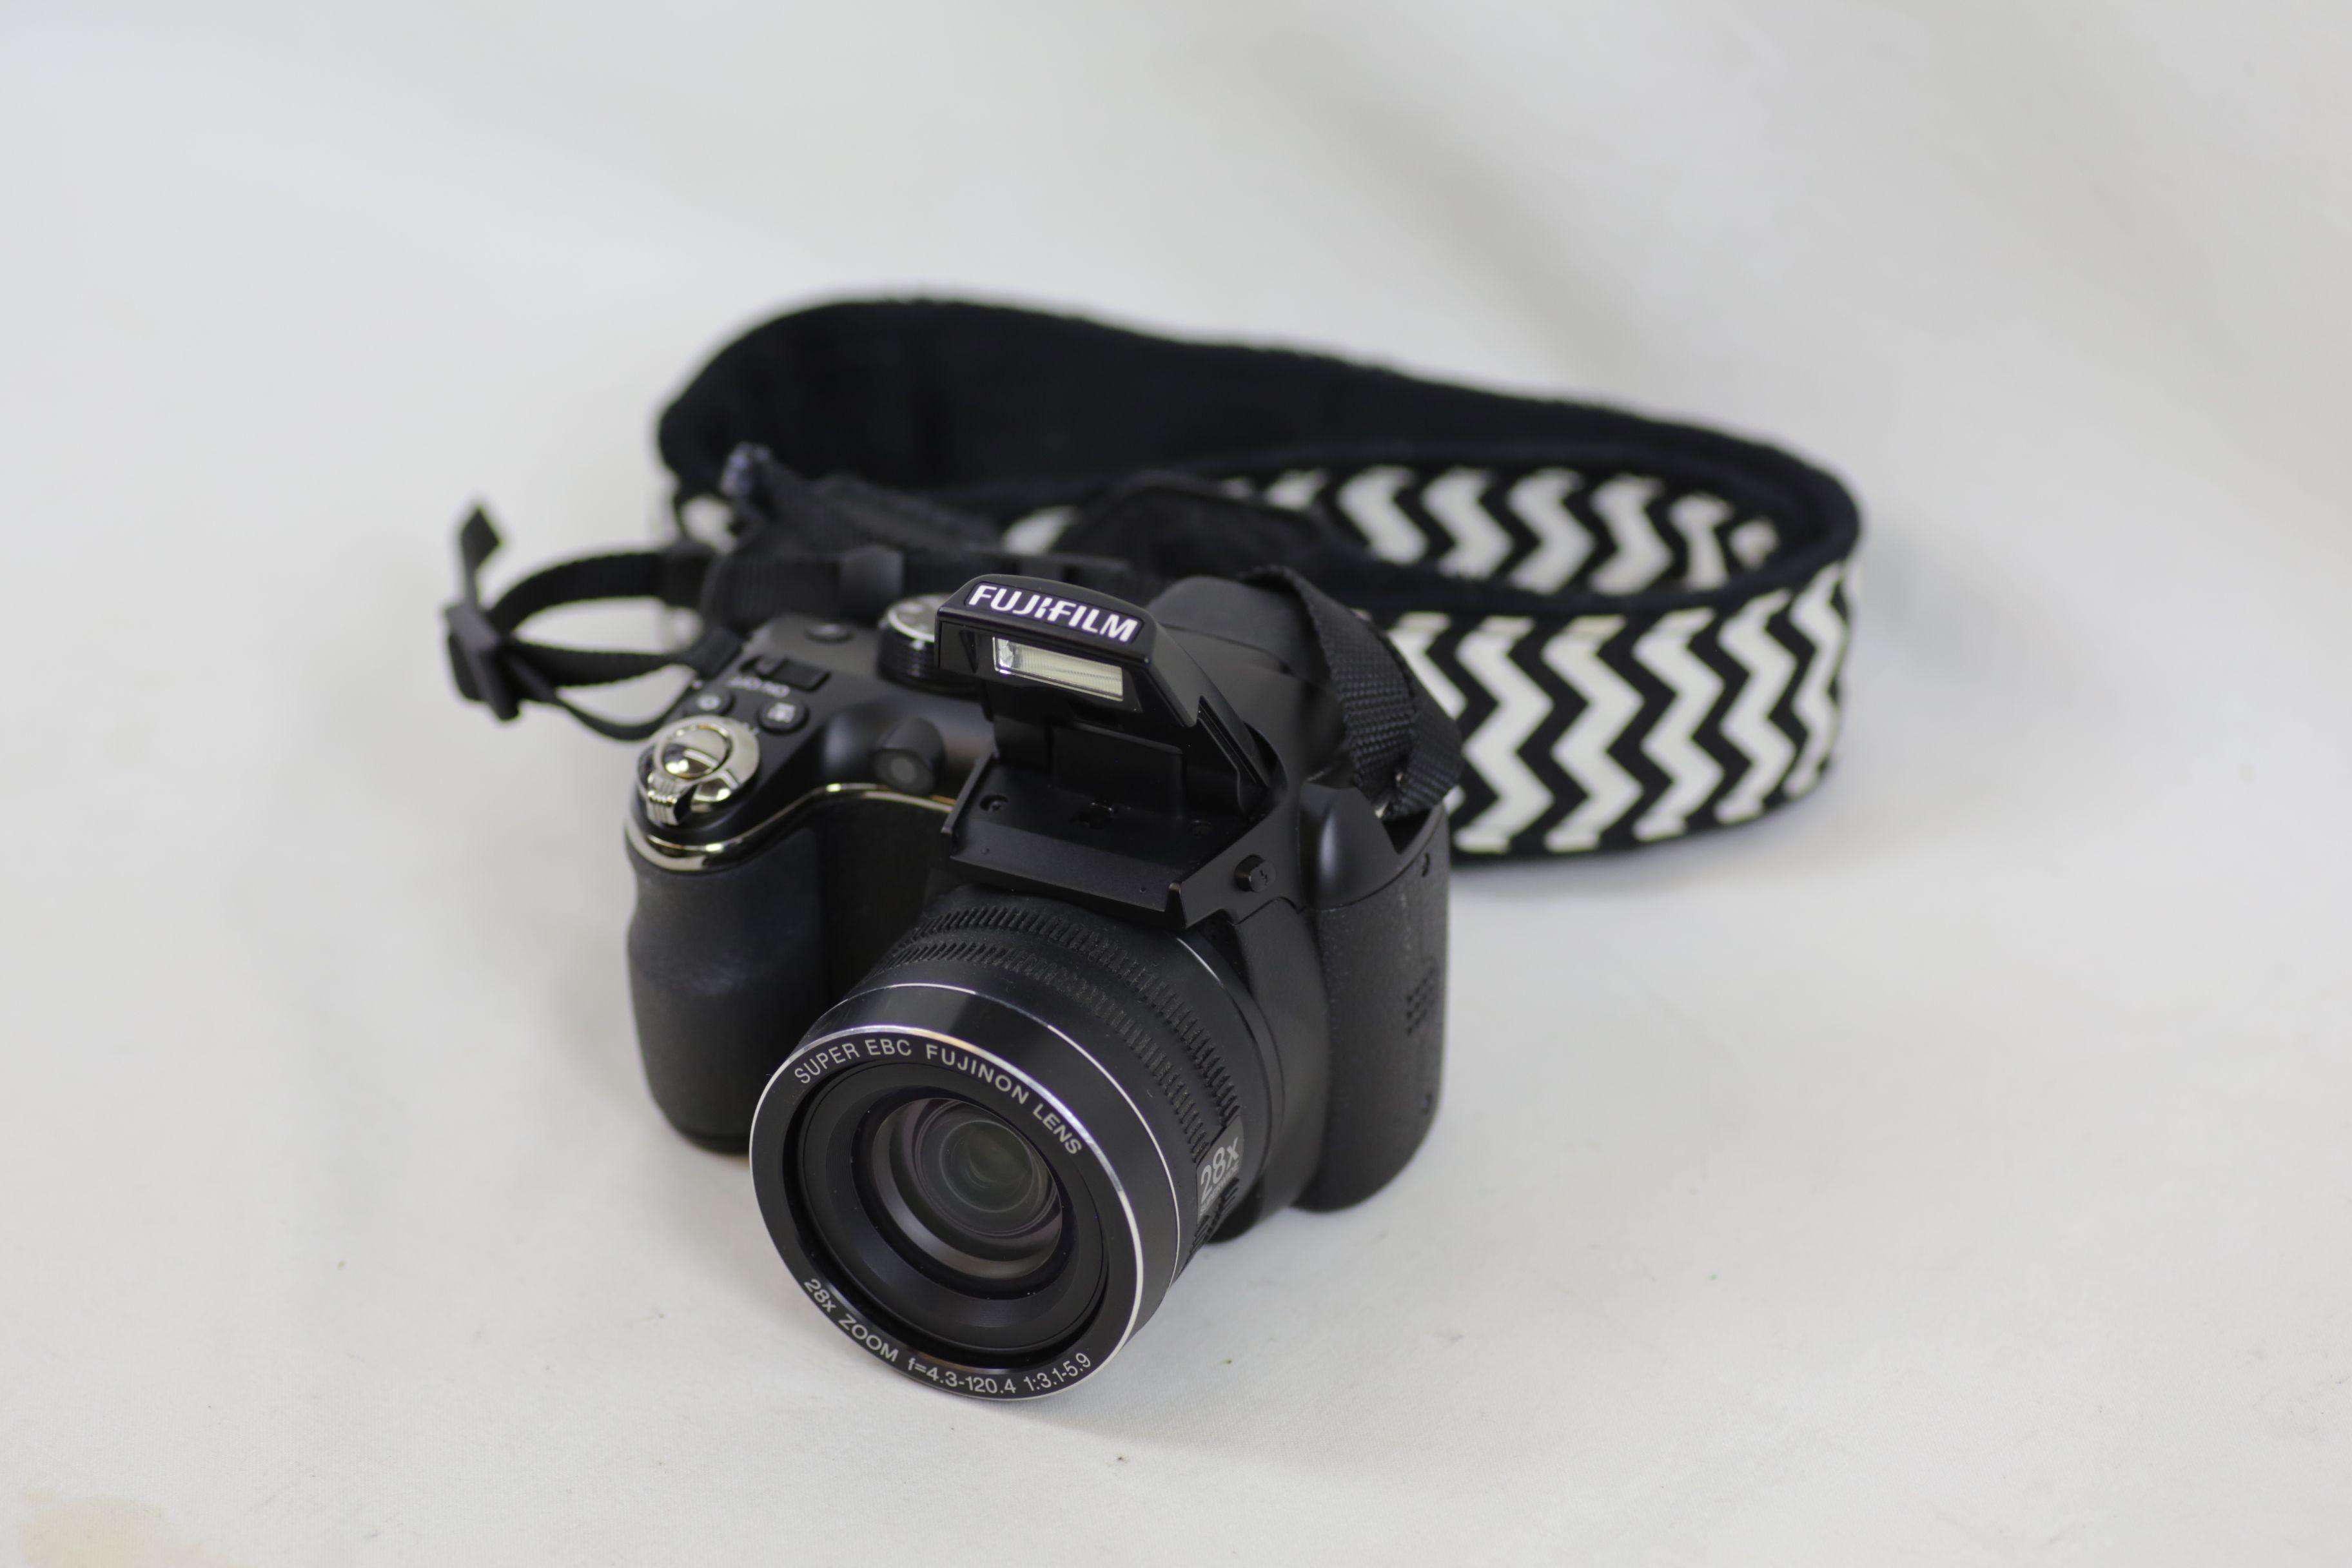 Fujifilm FinePix S Series S4400 14.0MP Digital Bridge Camera - Black